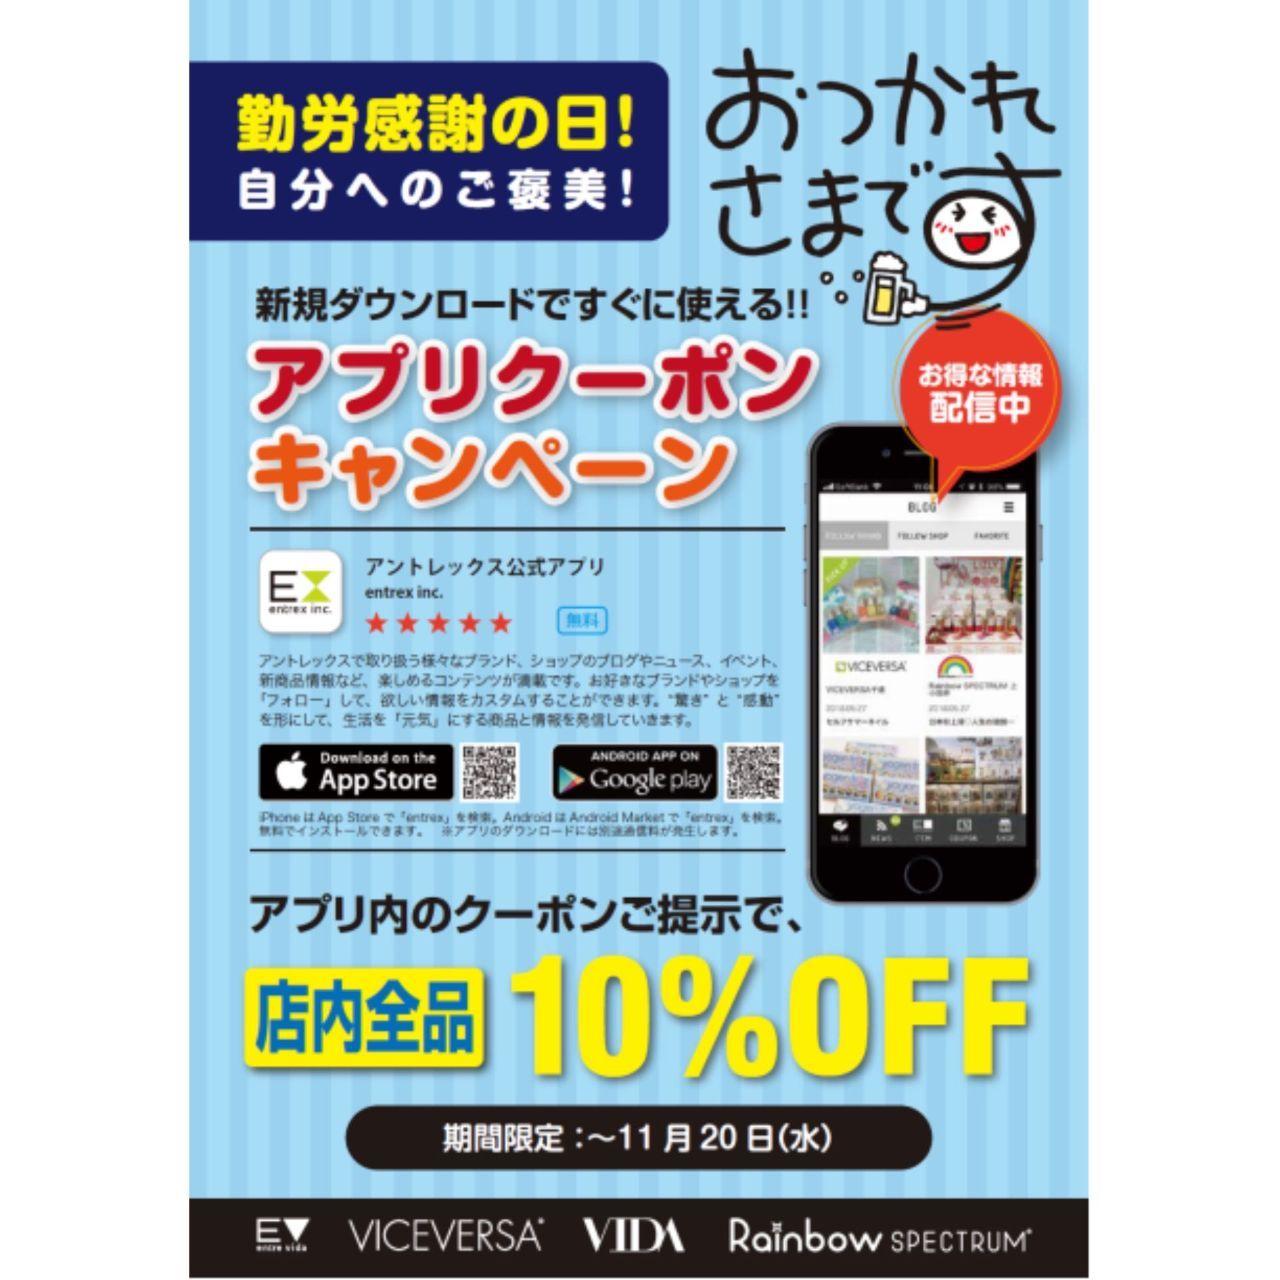 「【10%OFF】たくさん使える!お得なアプリクーポン!」の写真